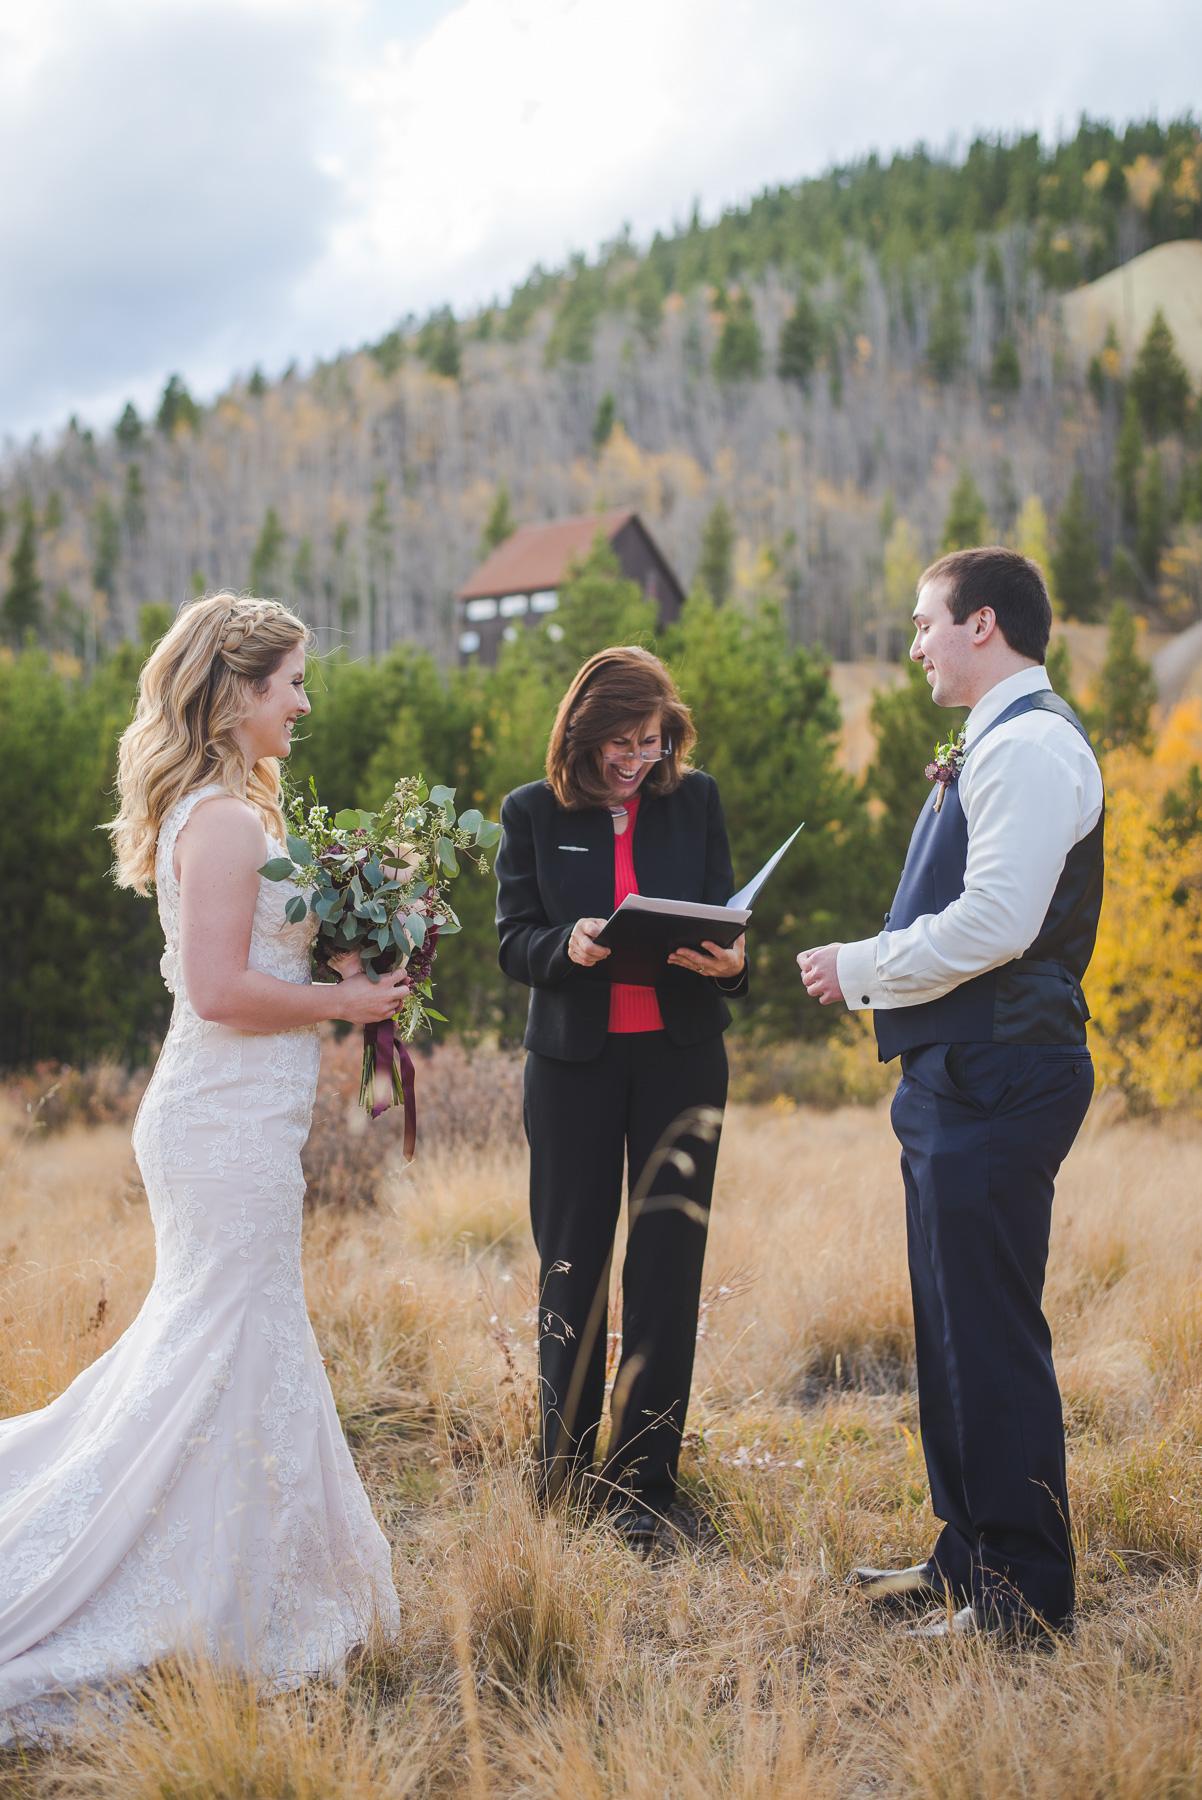 Autumn elopement in Breckenridge, Colorado | Summit Mountain Weddings